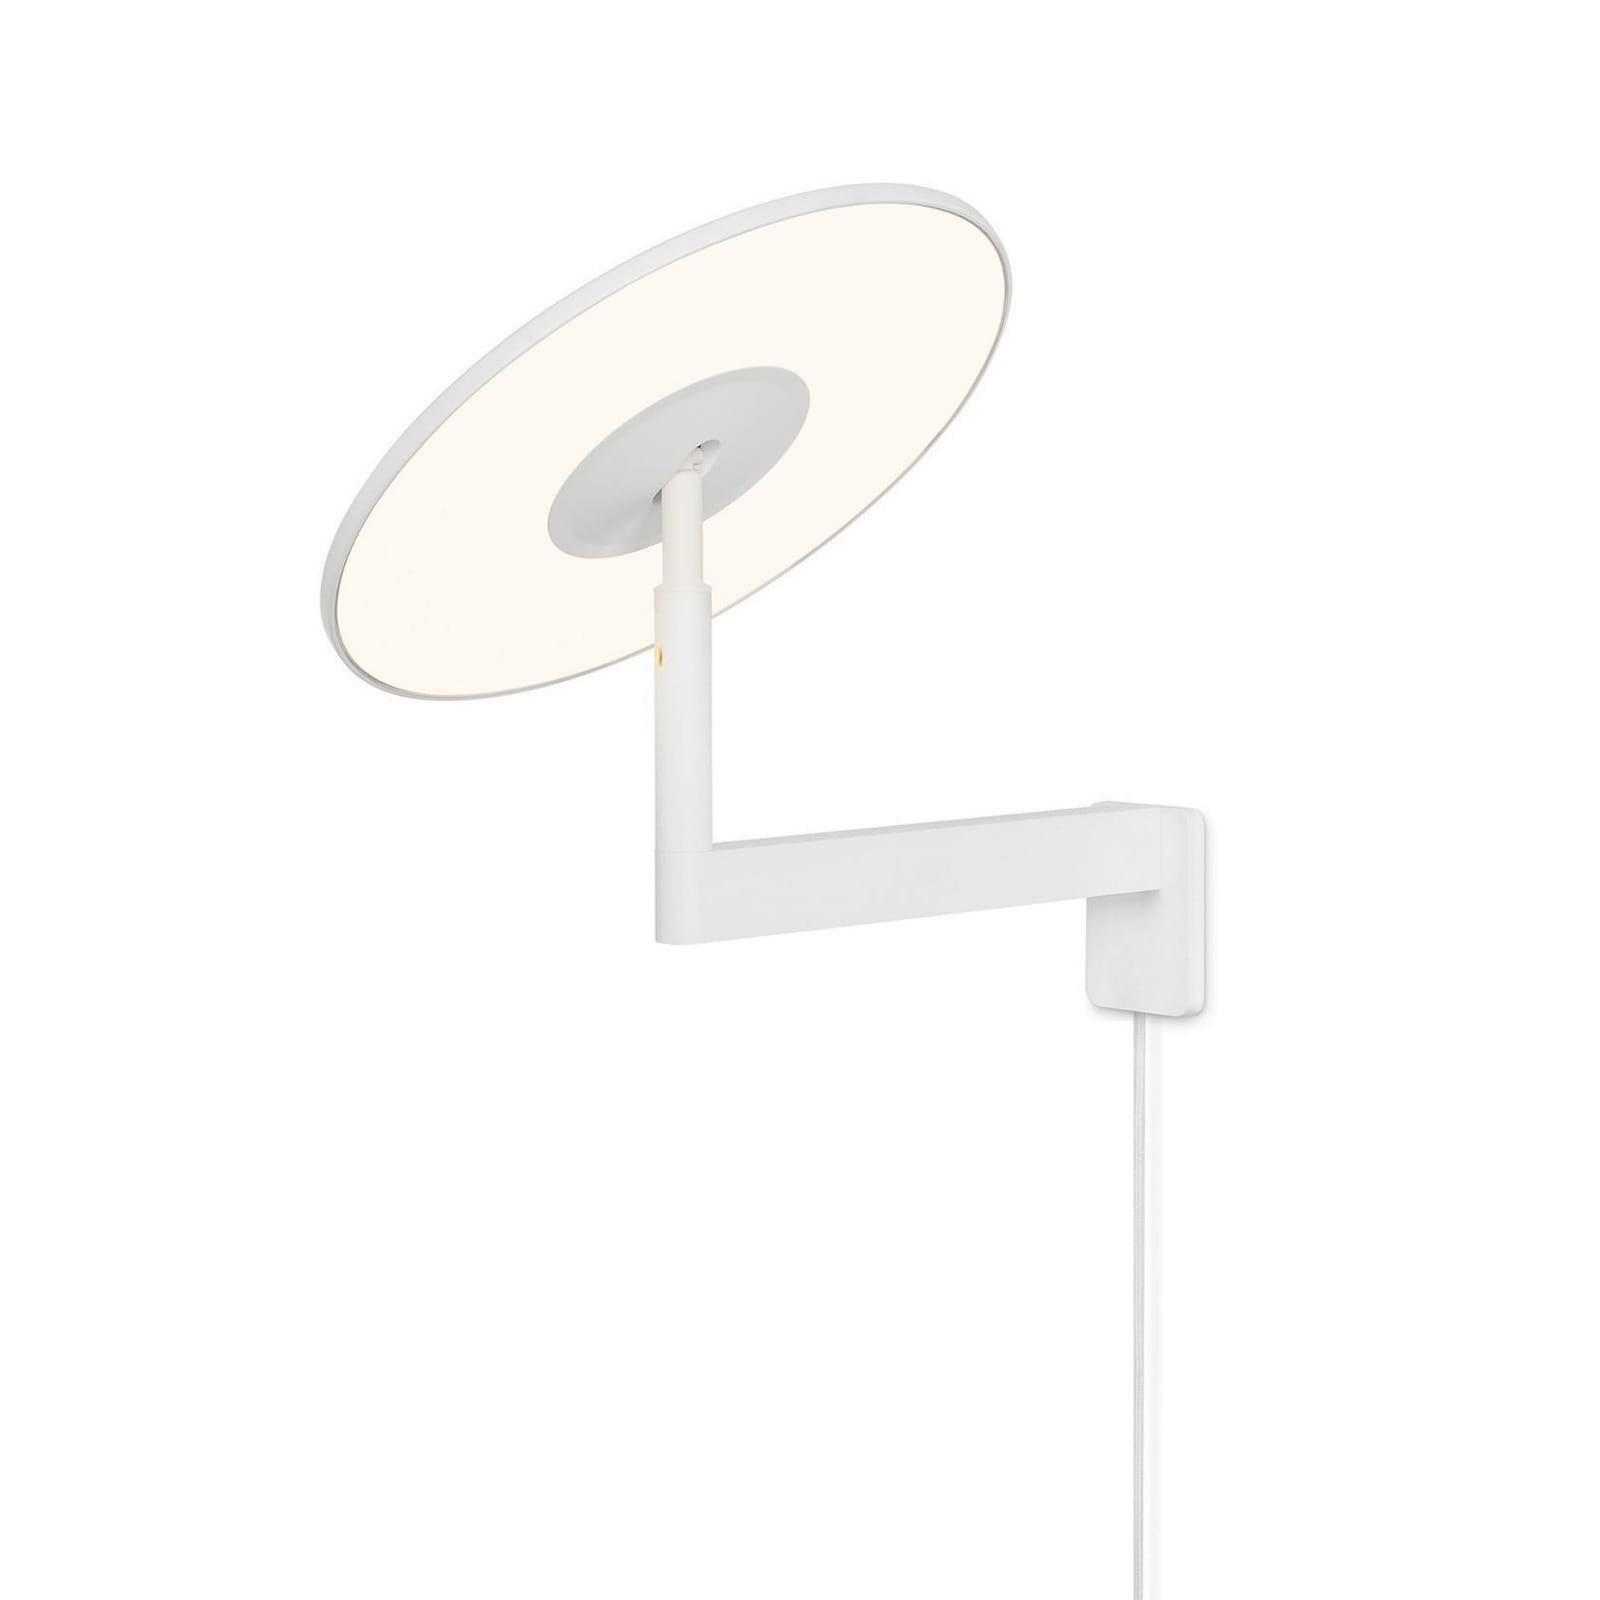 Circa 12 Φωτιστικό Τοίχου / Απλίκα LED (Λευκό) - Pablo Designs